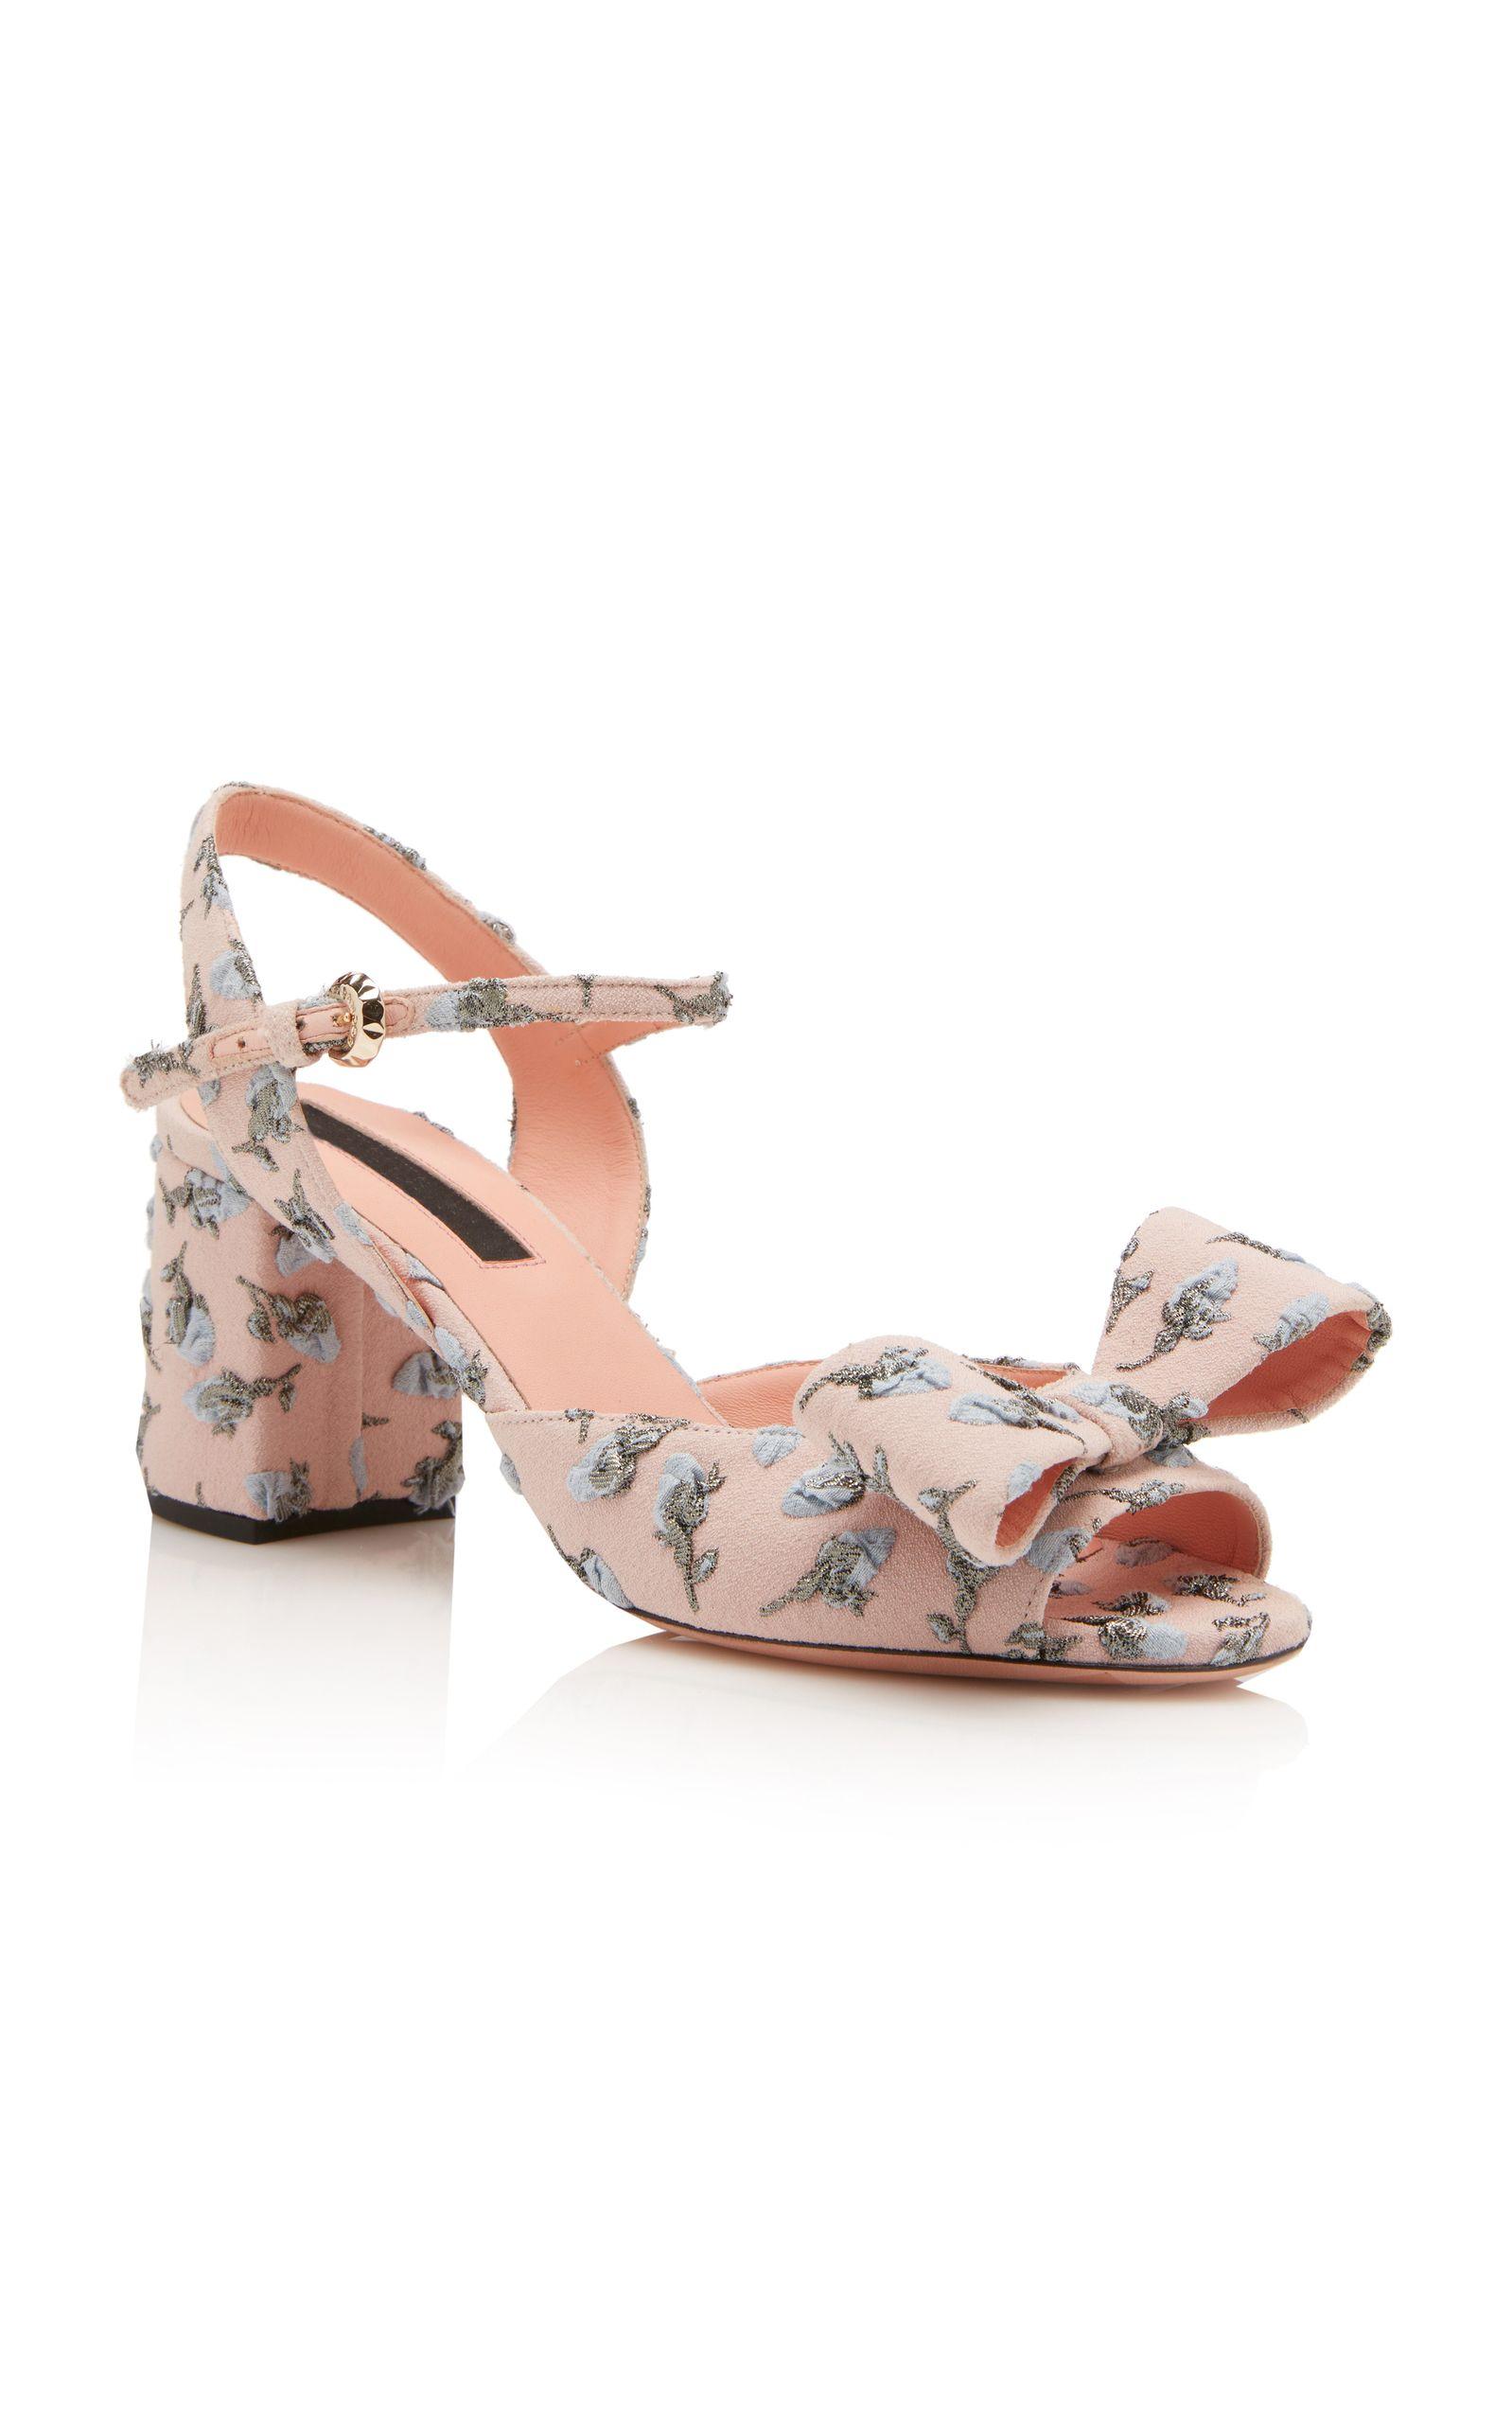 Flower bud mid heel sandal by rochas for preorder on moda operandi flower bud mid heel sandal by rochas for preorder on moda operandi mightylinksfo Gallery